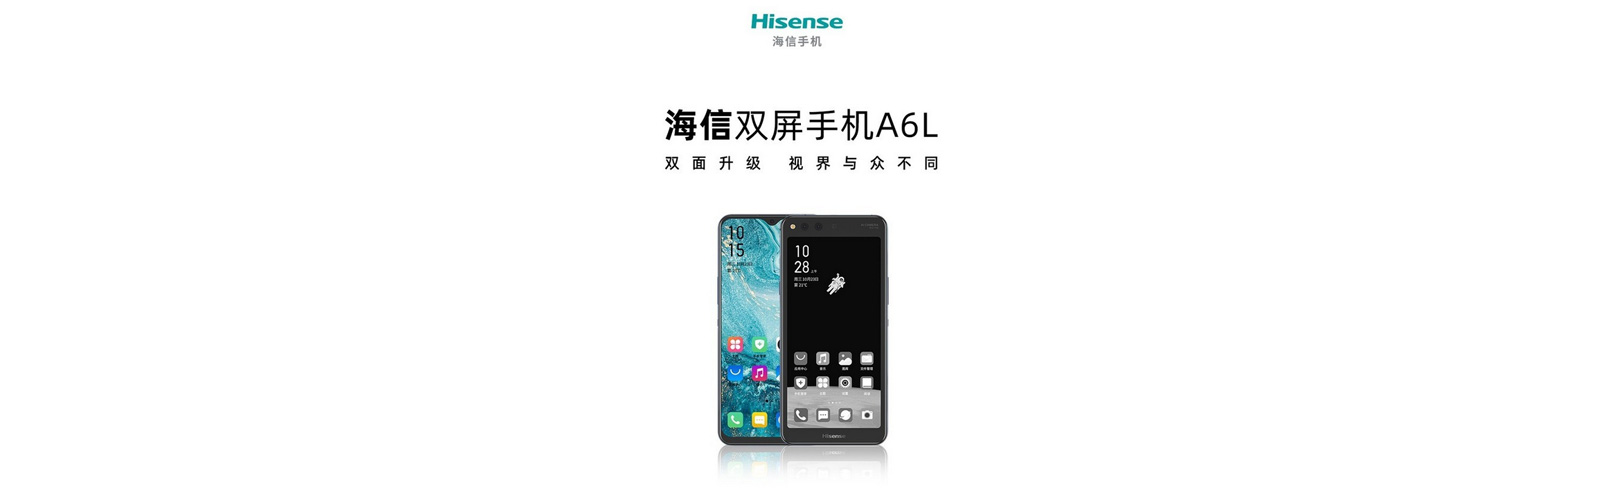 Hisense has announced the dual-screen Hisense A6L and the Hisense A5 smartphones